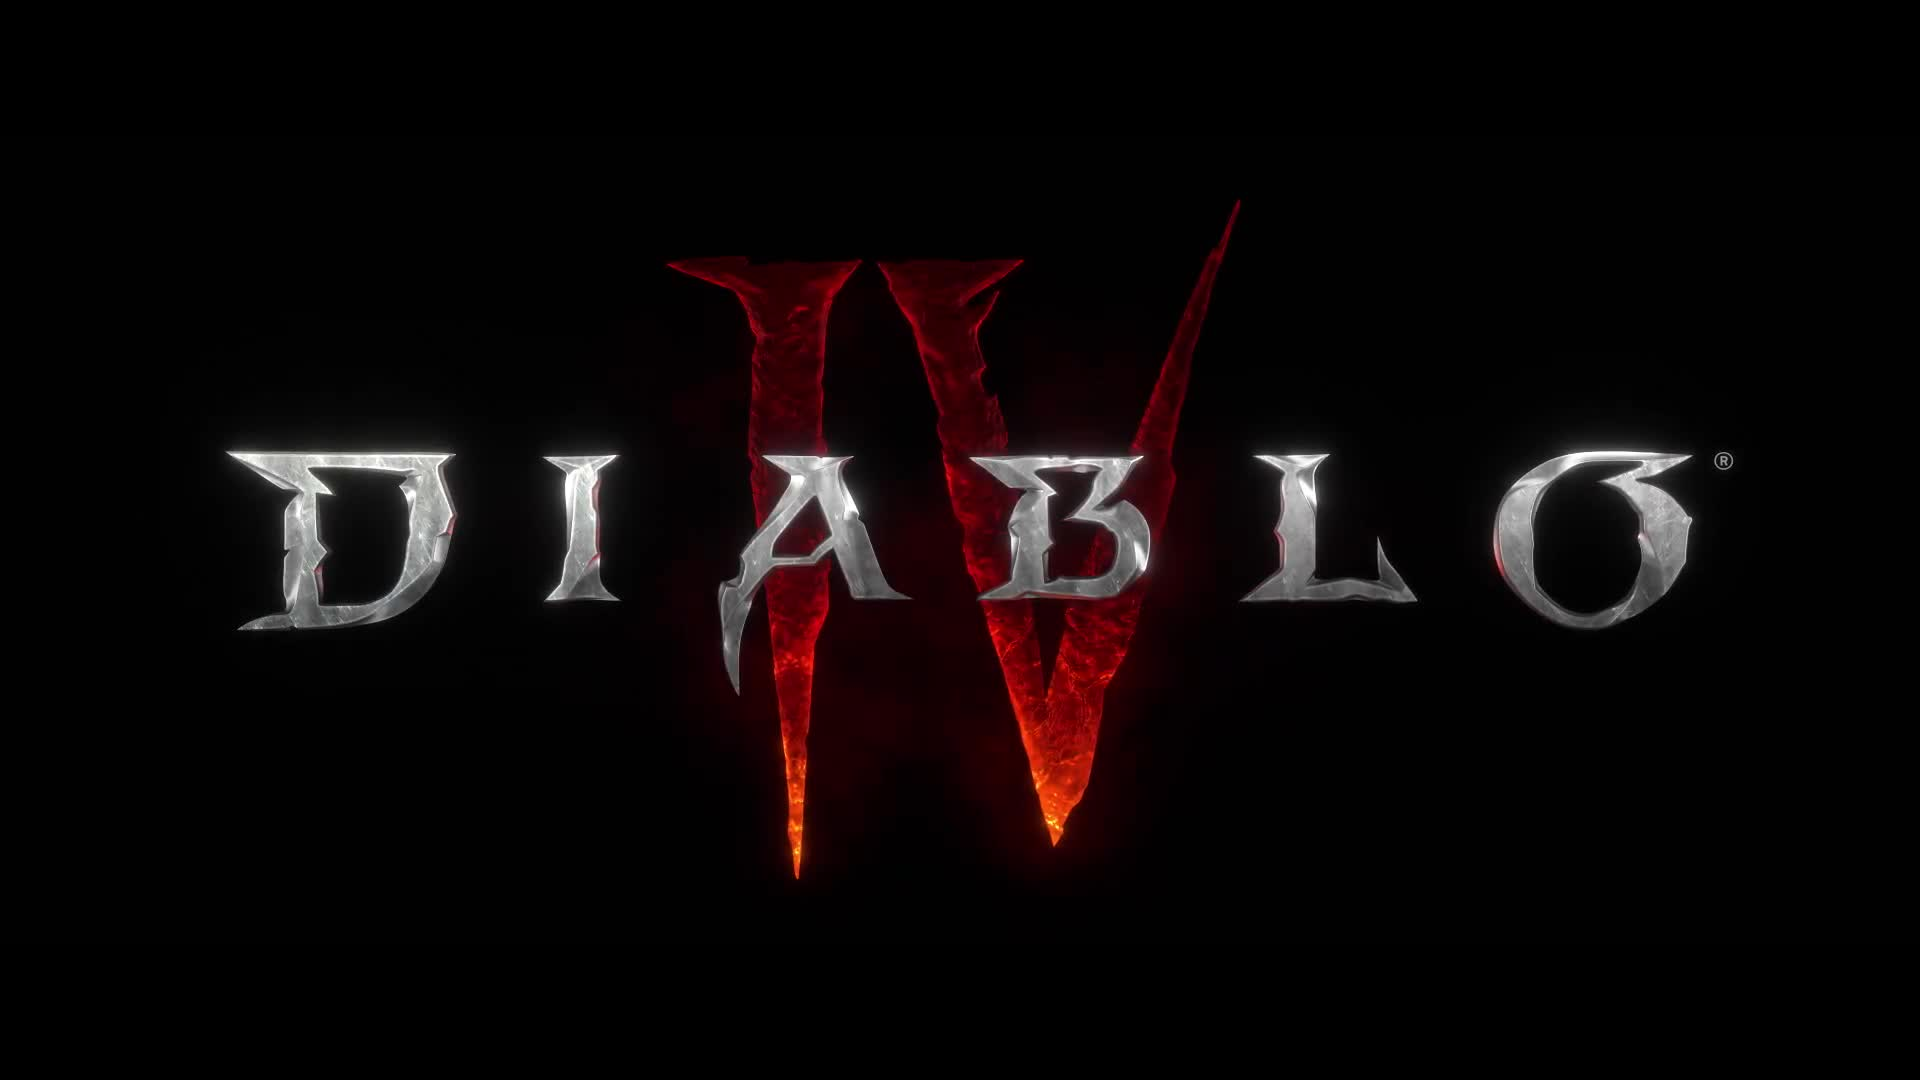 Trailer, Spiel, Rollenspiel, Blizzard, Ankündigung, Diablo, Blizzcon, Diablo 4, Blizzcon 2019, Blizzard Entertainment, Diablo IV